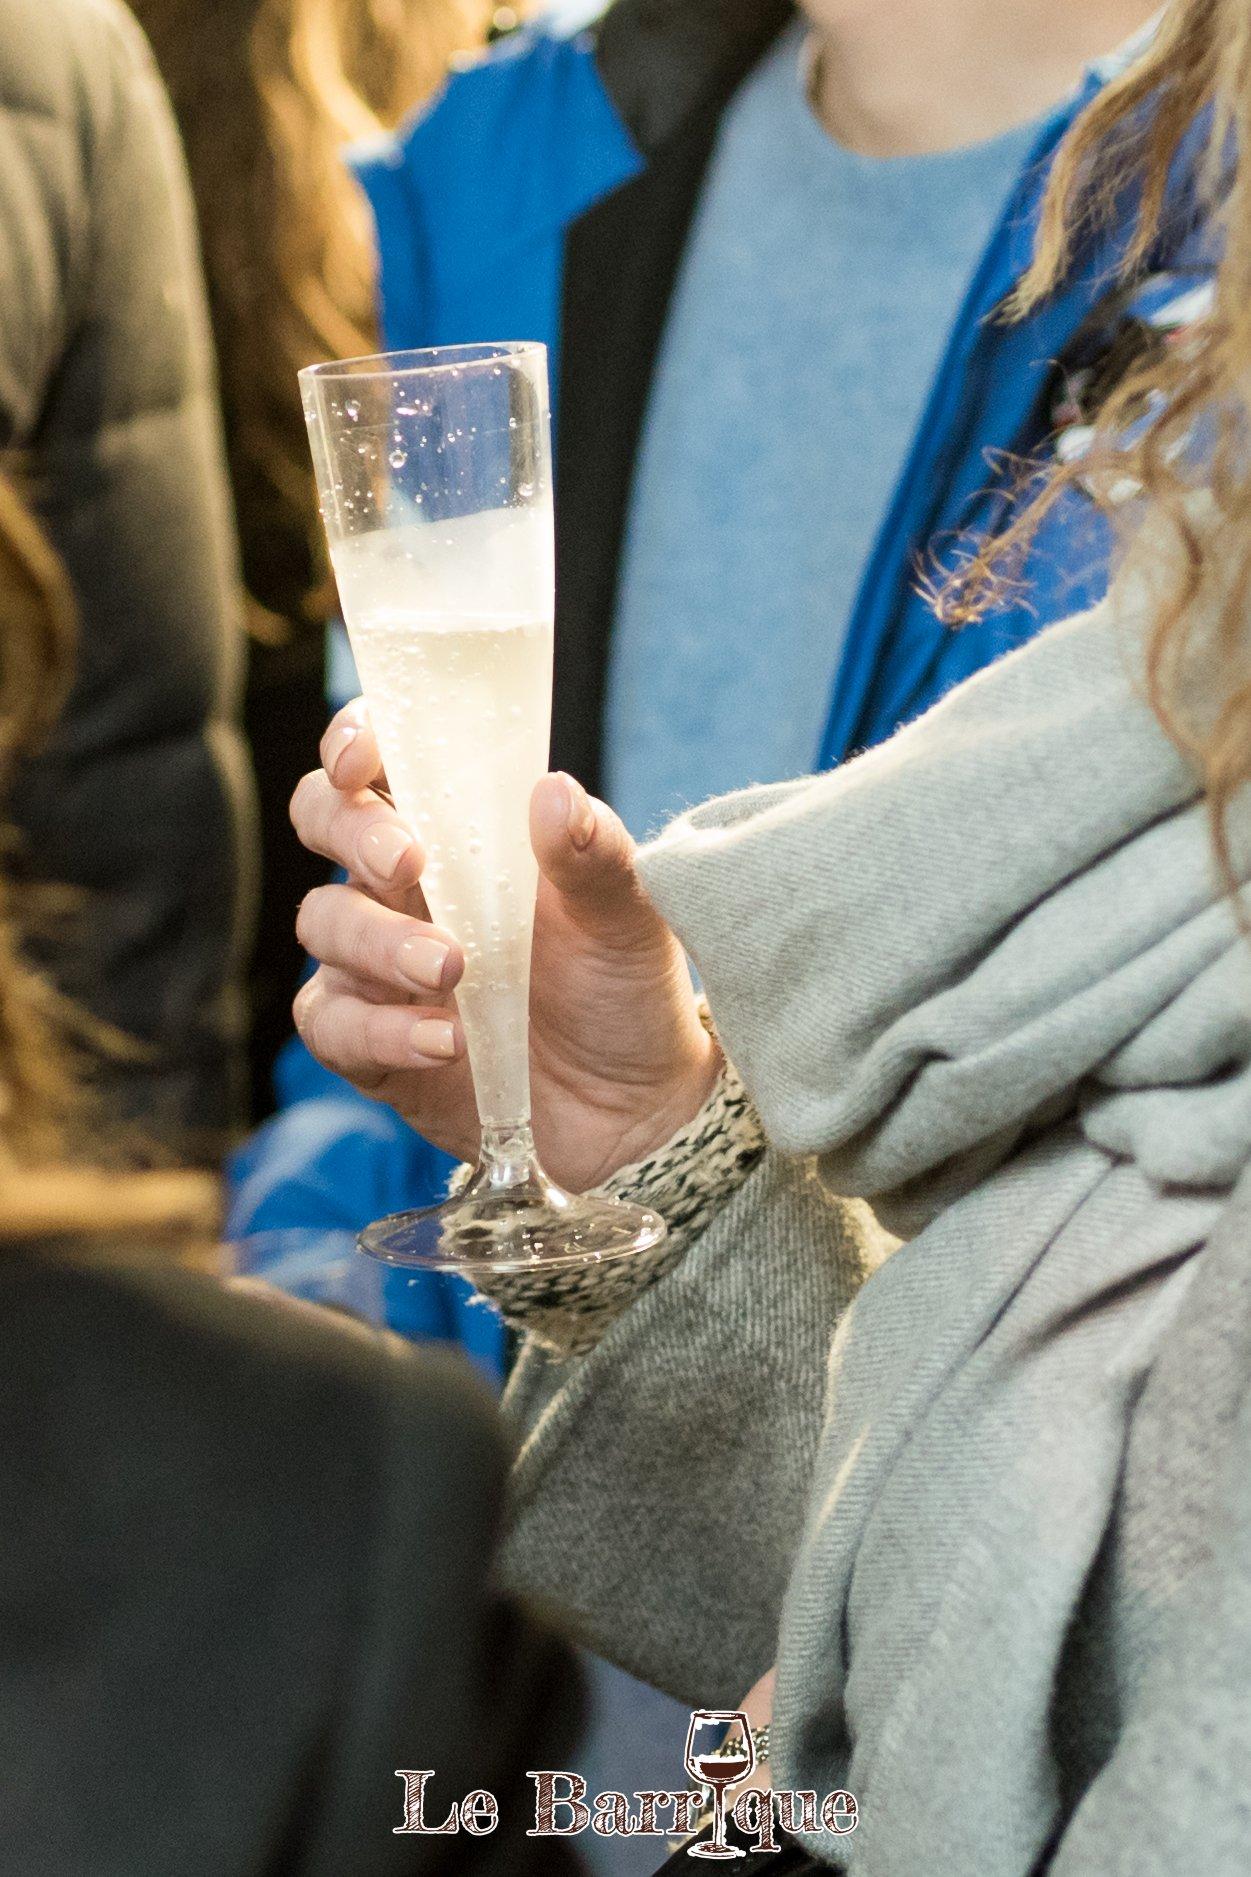 Bicchiere di Champagne in mano a una donna